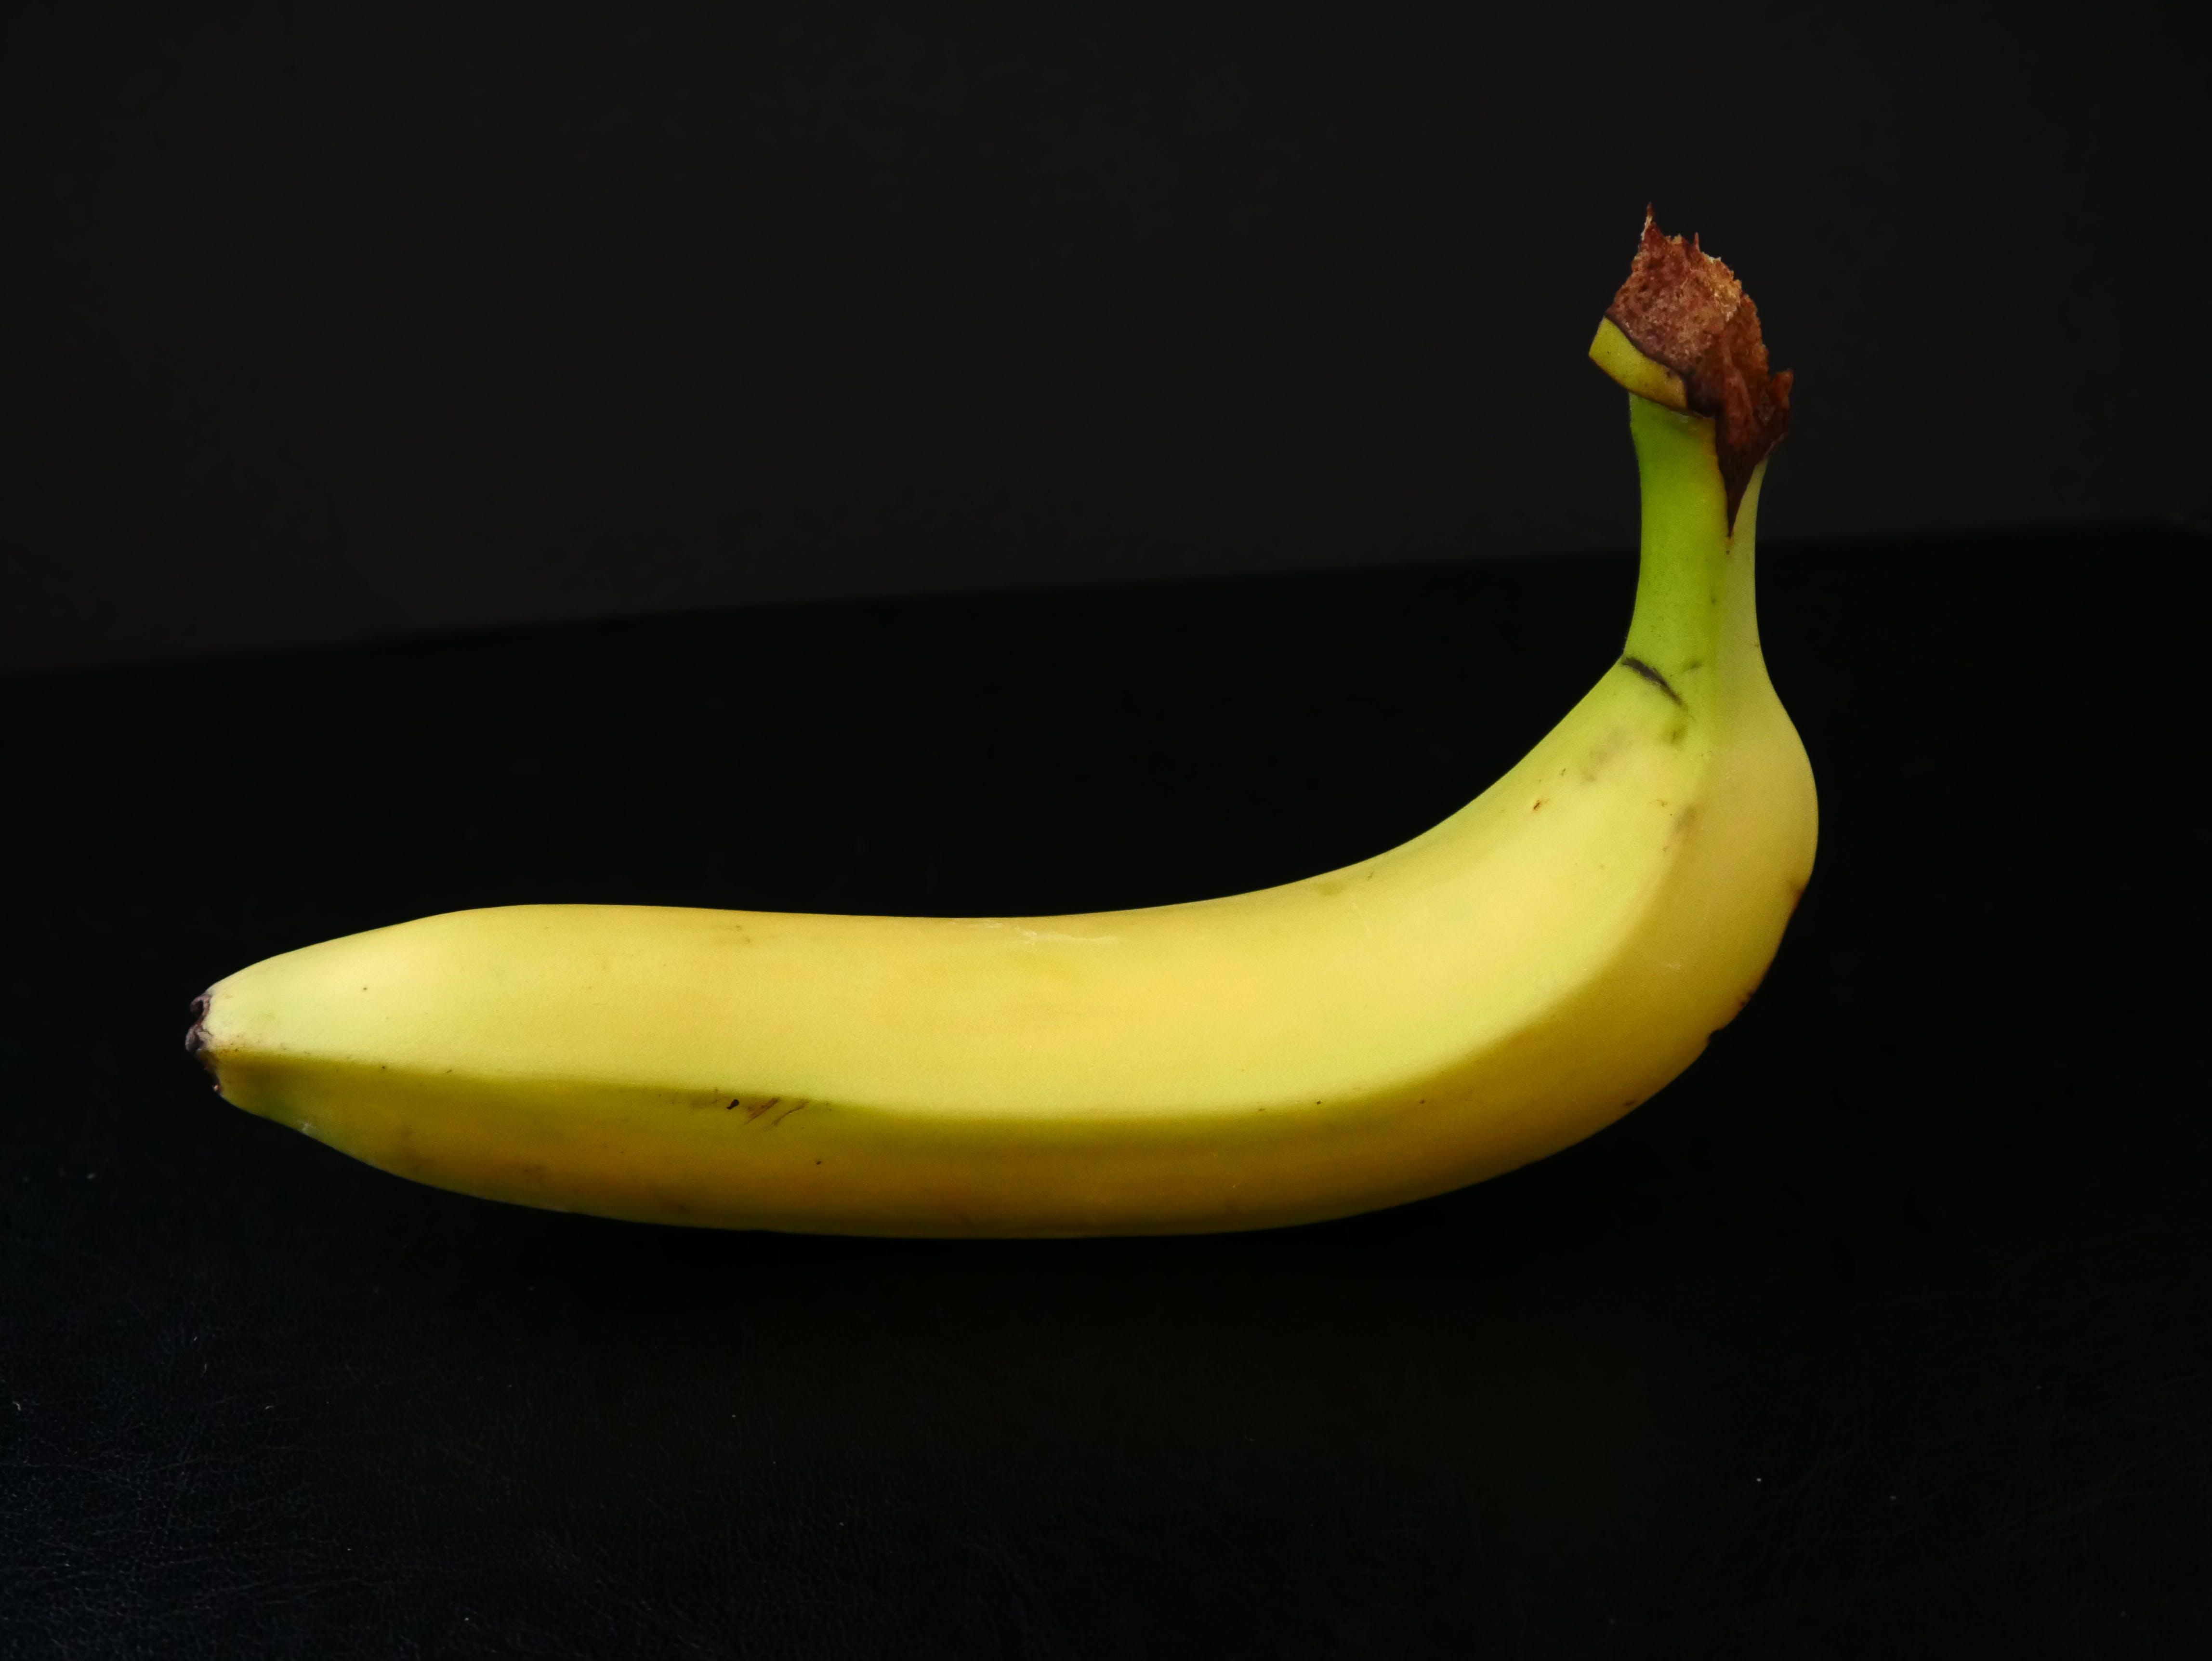 Free stock photo of yellow, banana, fruit, background